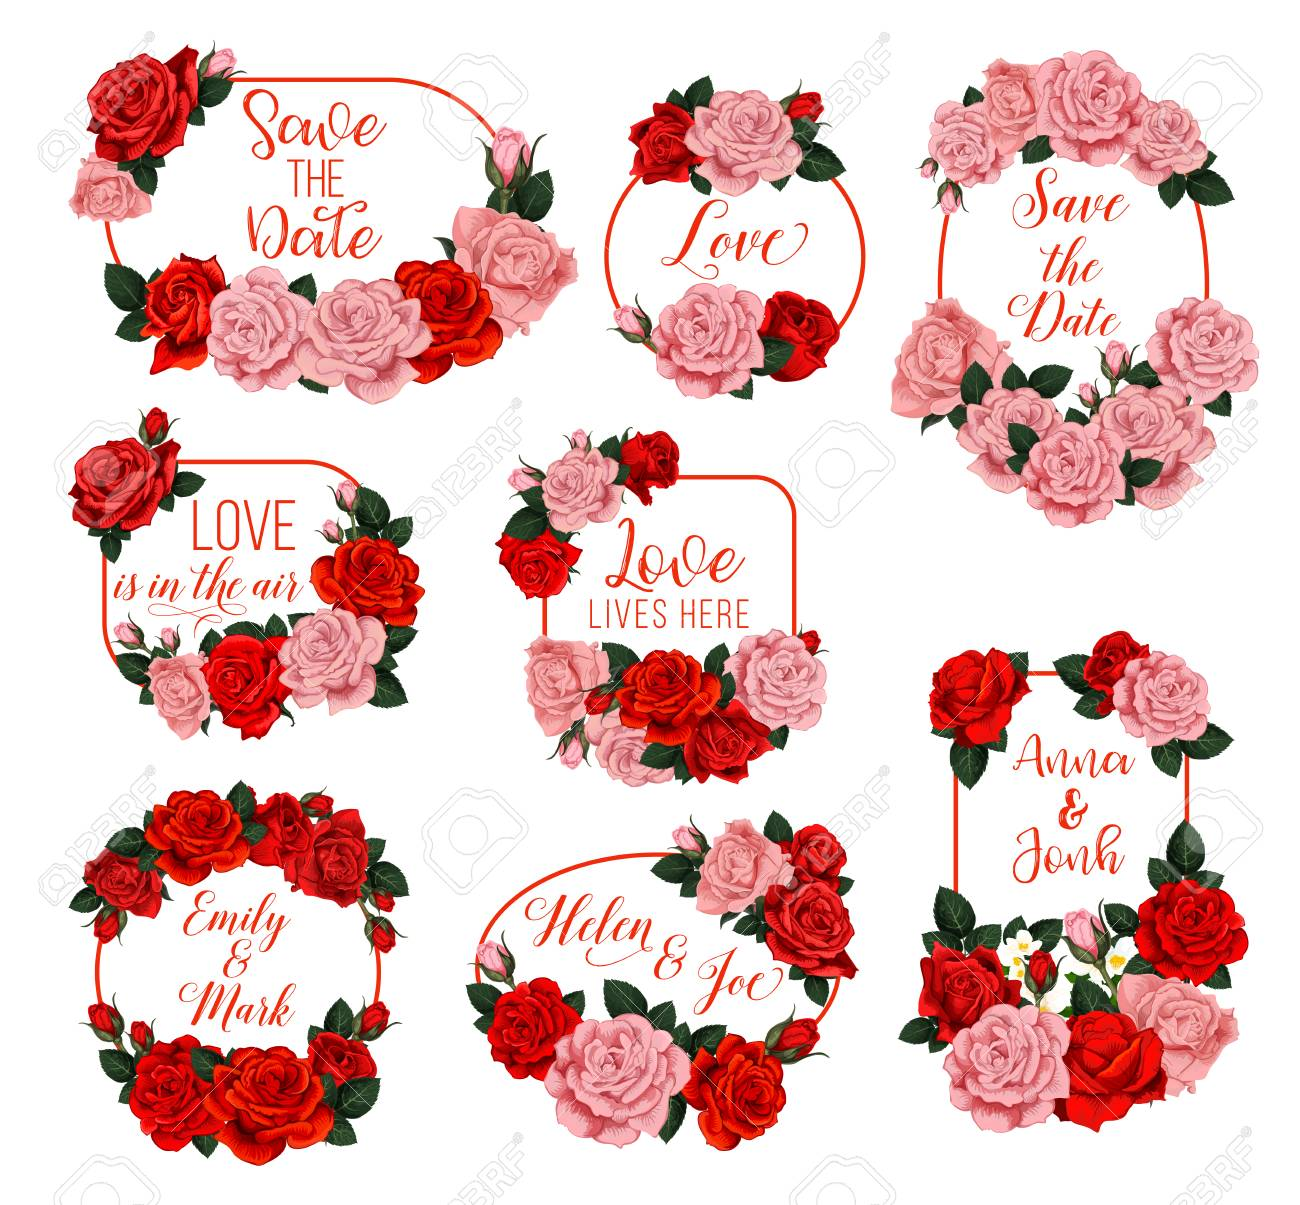 Beautiful Love Quotes For Wedding Invitation Frieze - Invitations ...